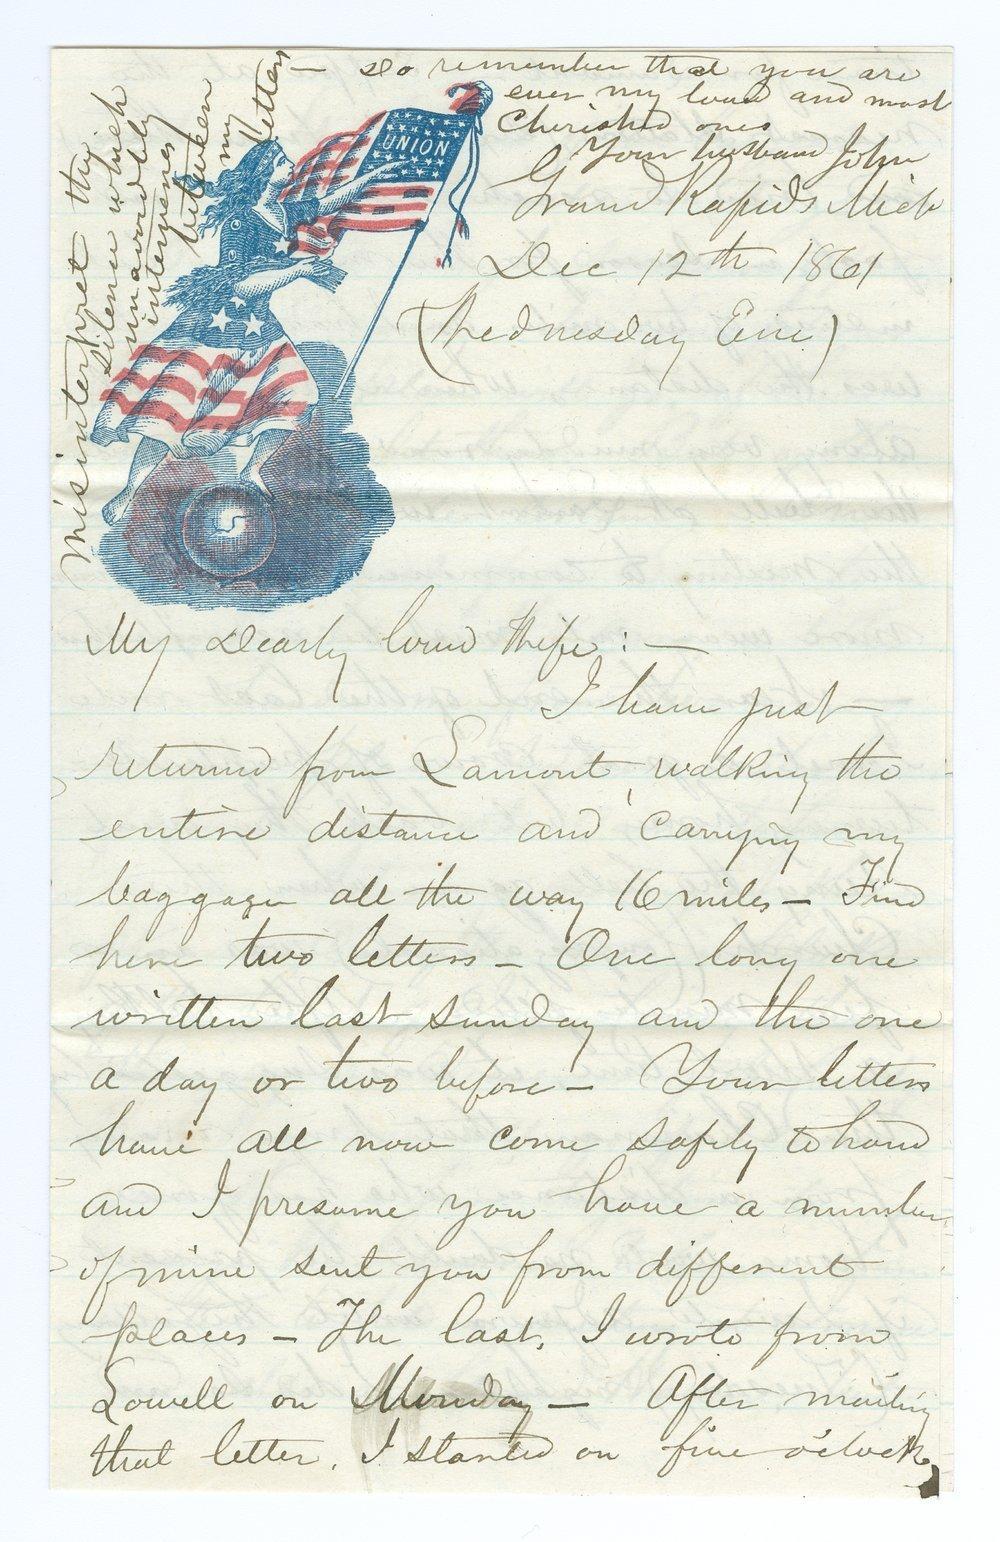 John Brown, Jr. correspondence - 9